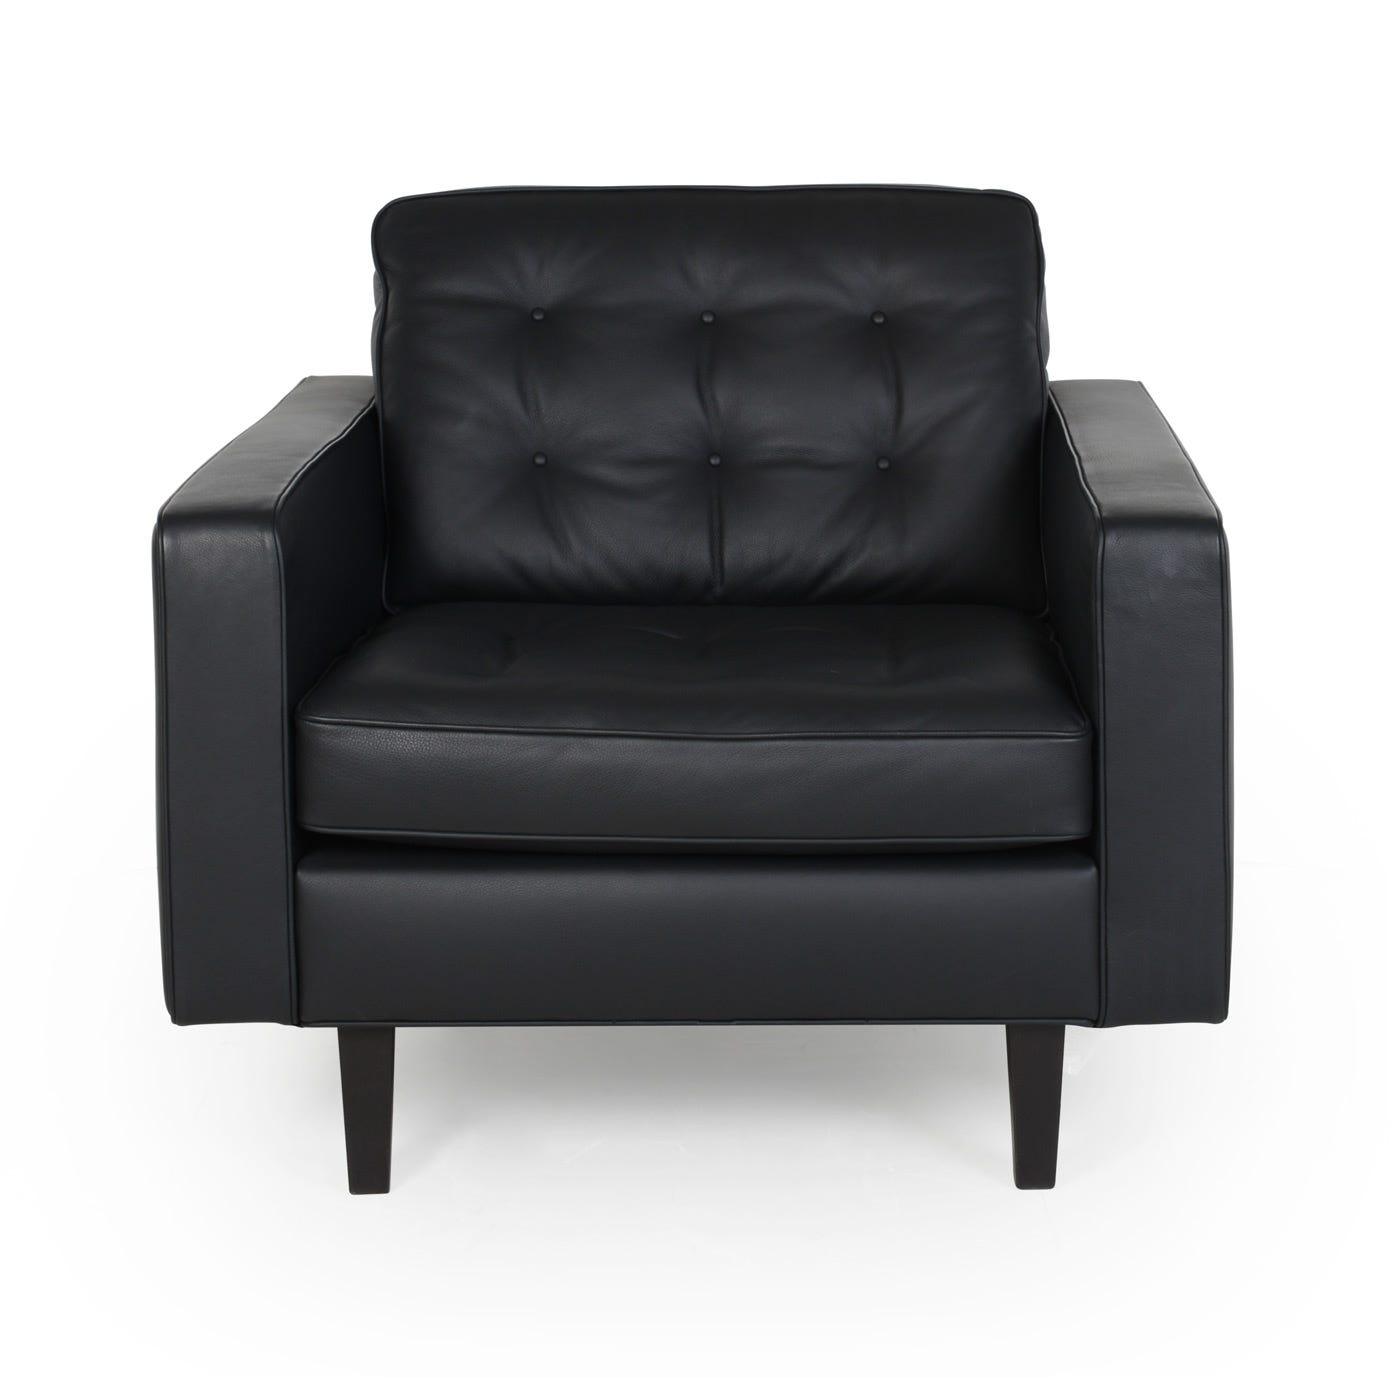 Heal's Hepburn Armchair Leather Grain White 000 Natural Feet